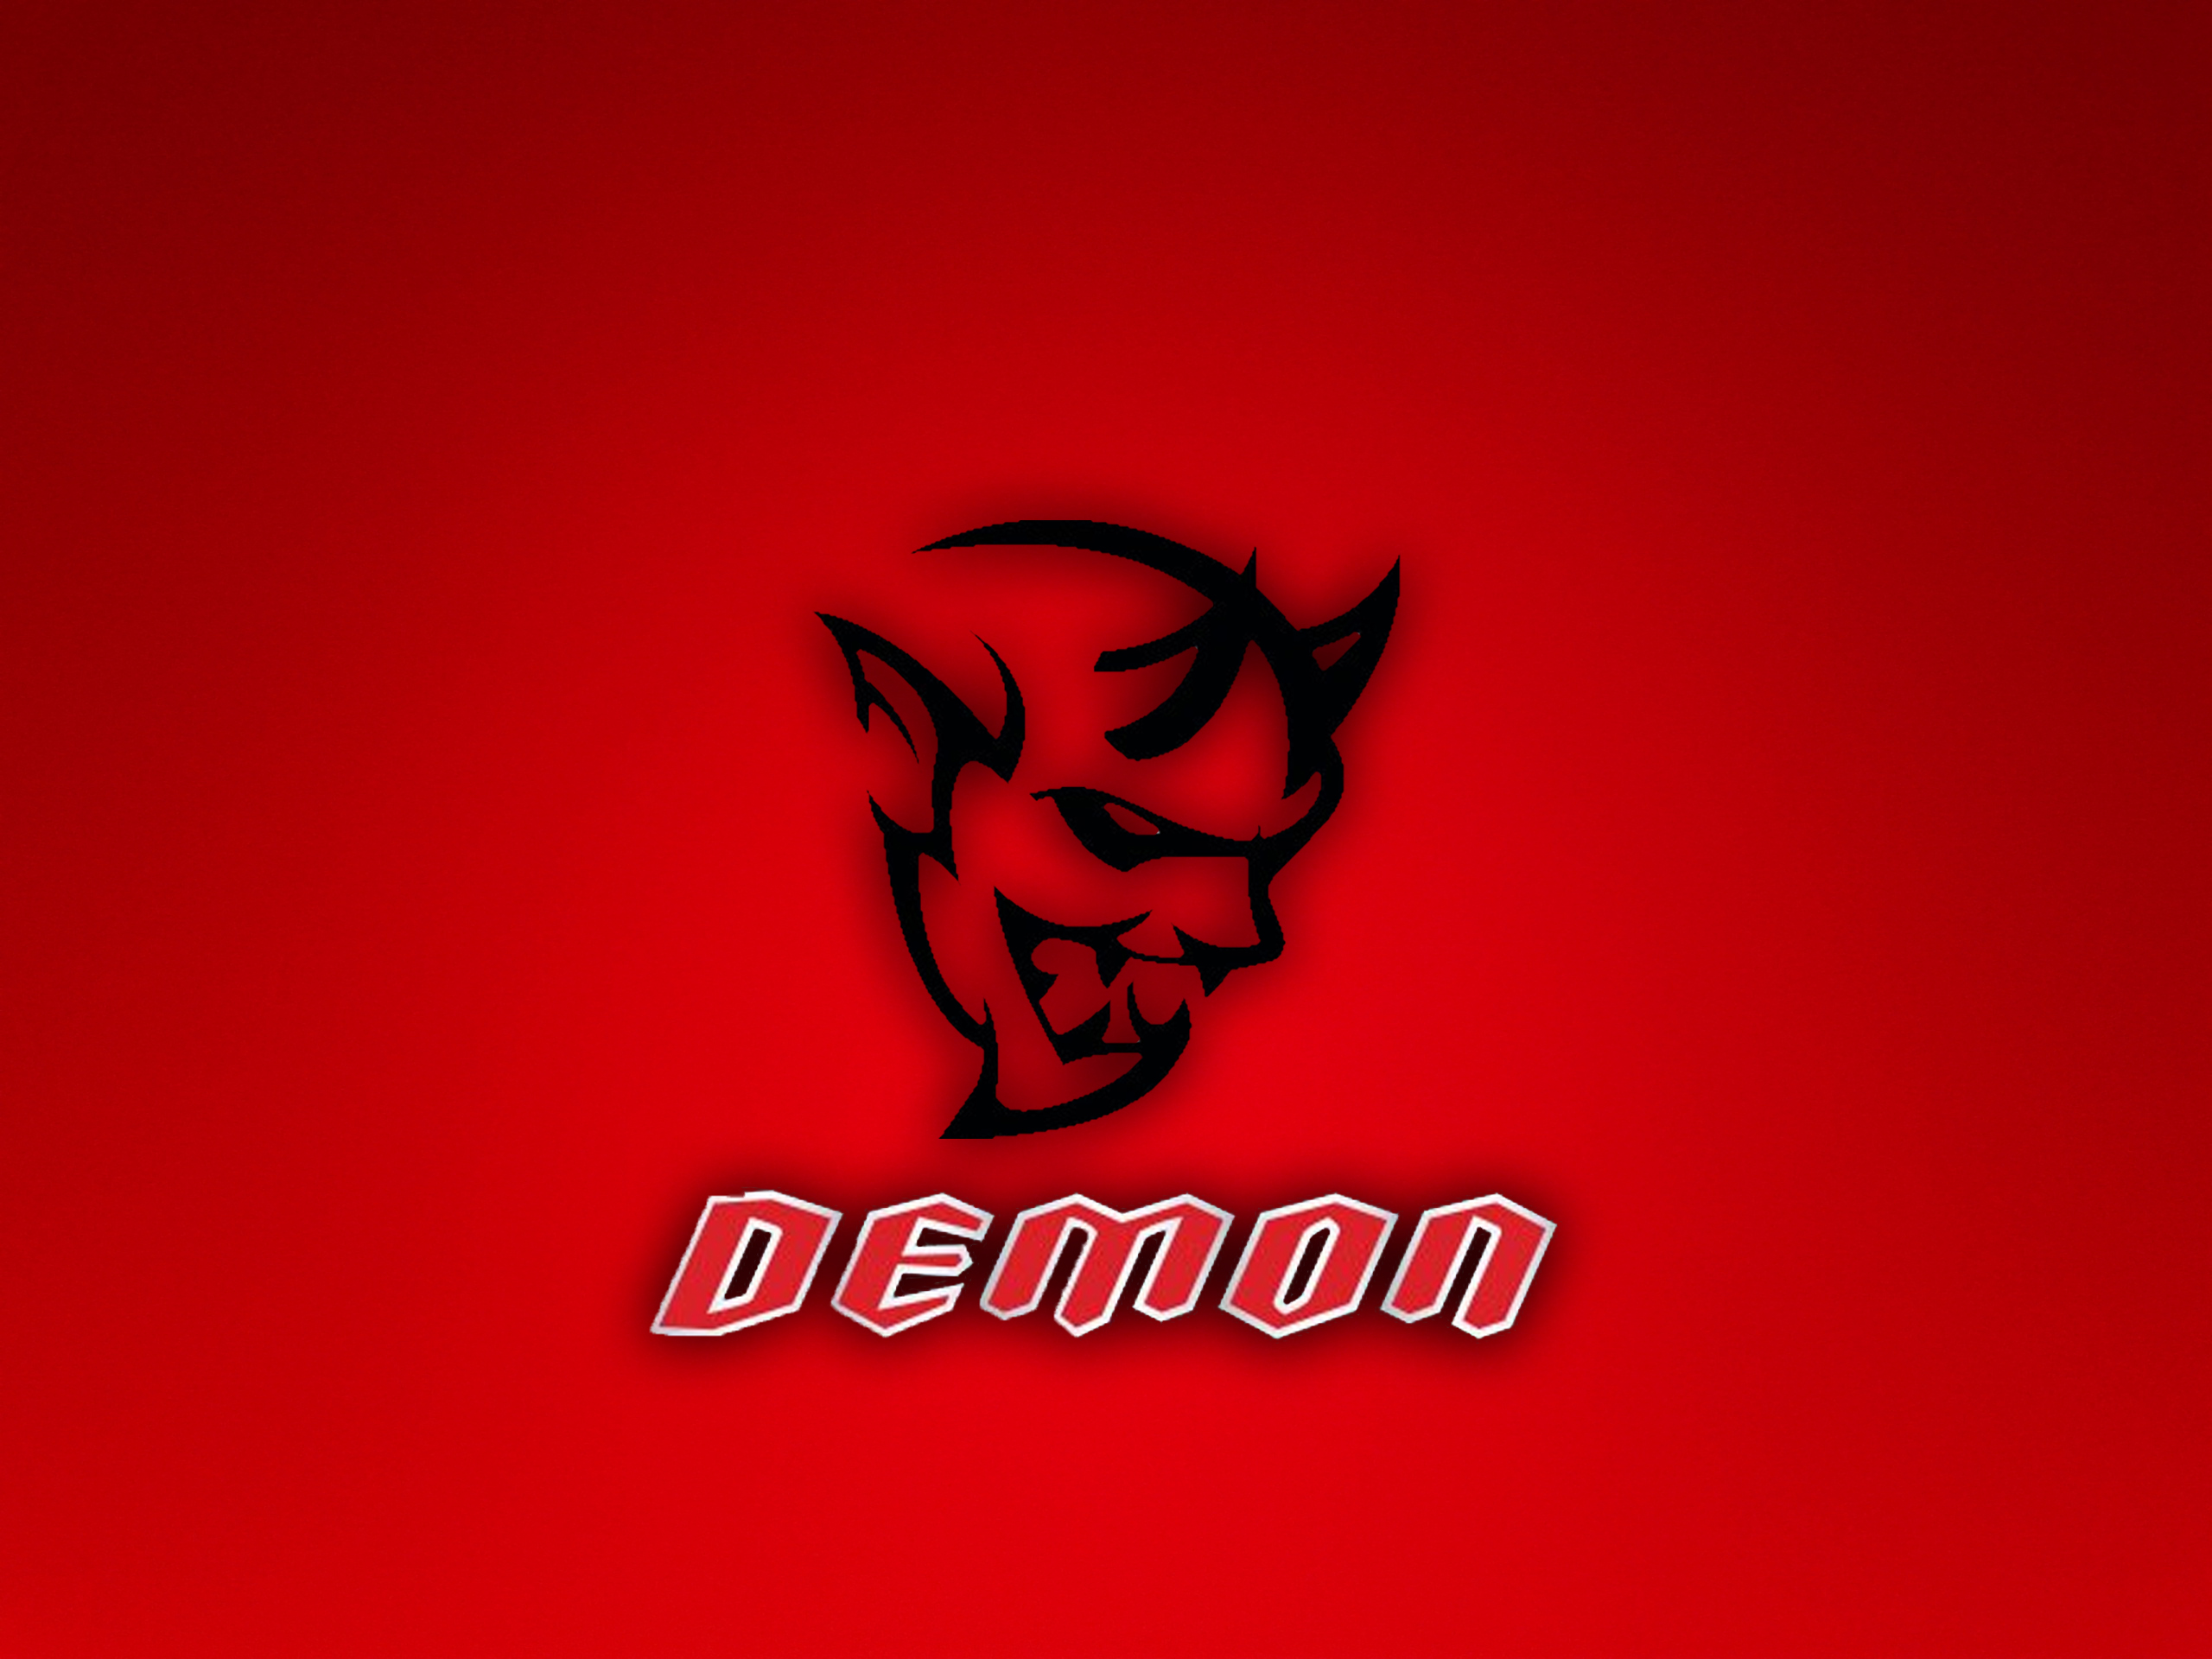 Dodge Challenger Demon Logo Wallpaper by theTINYchicken on